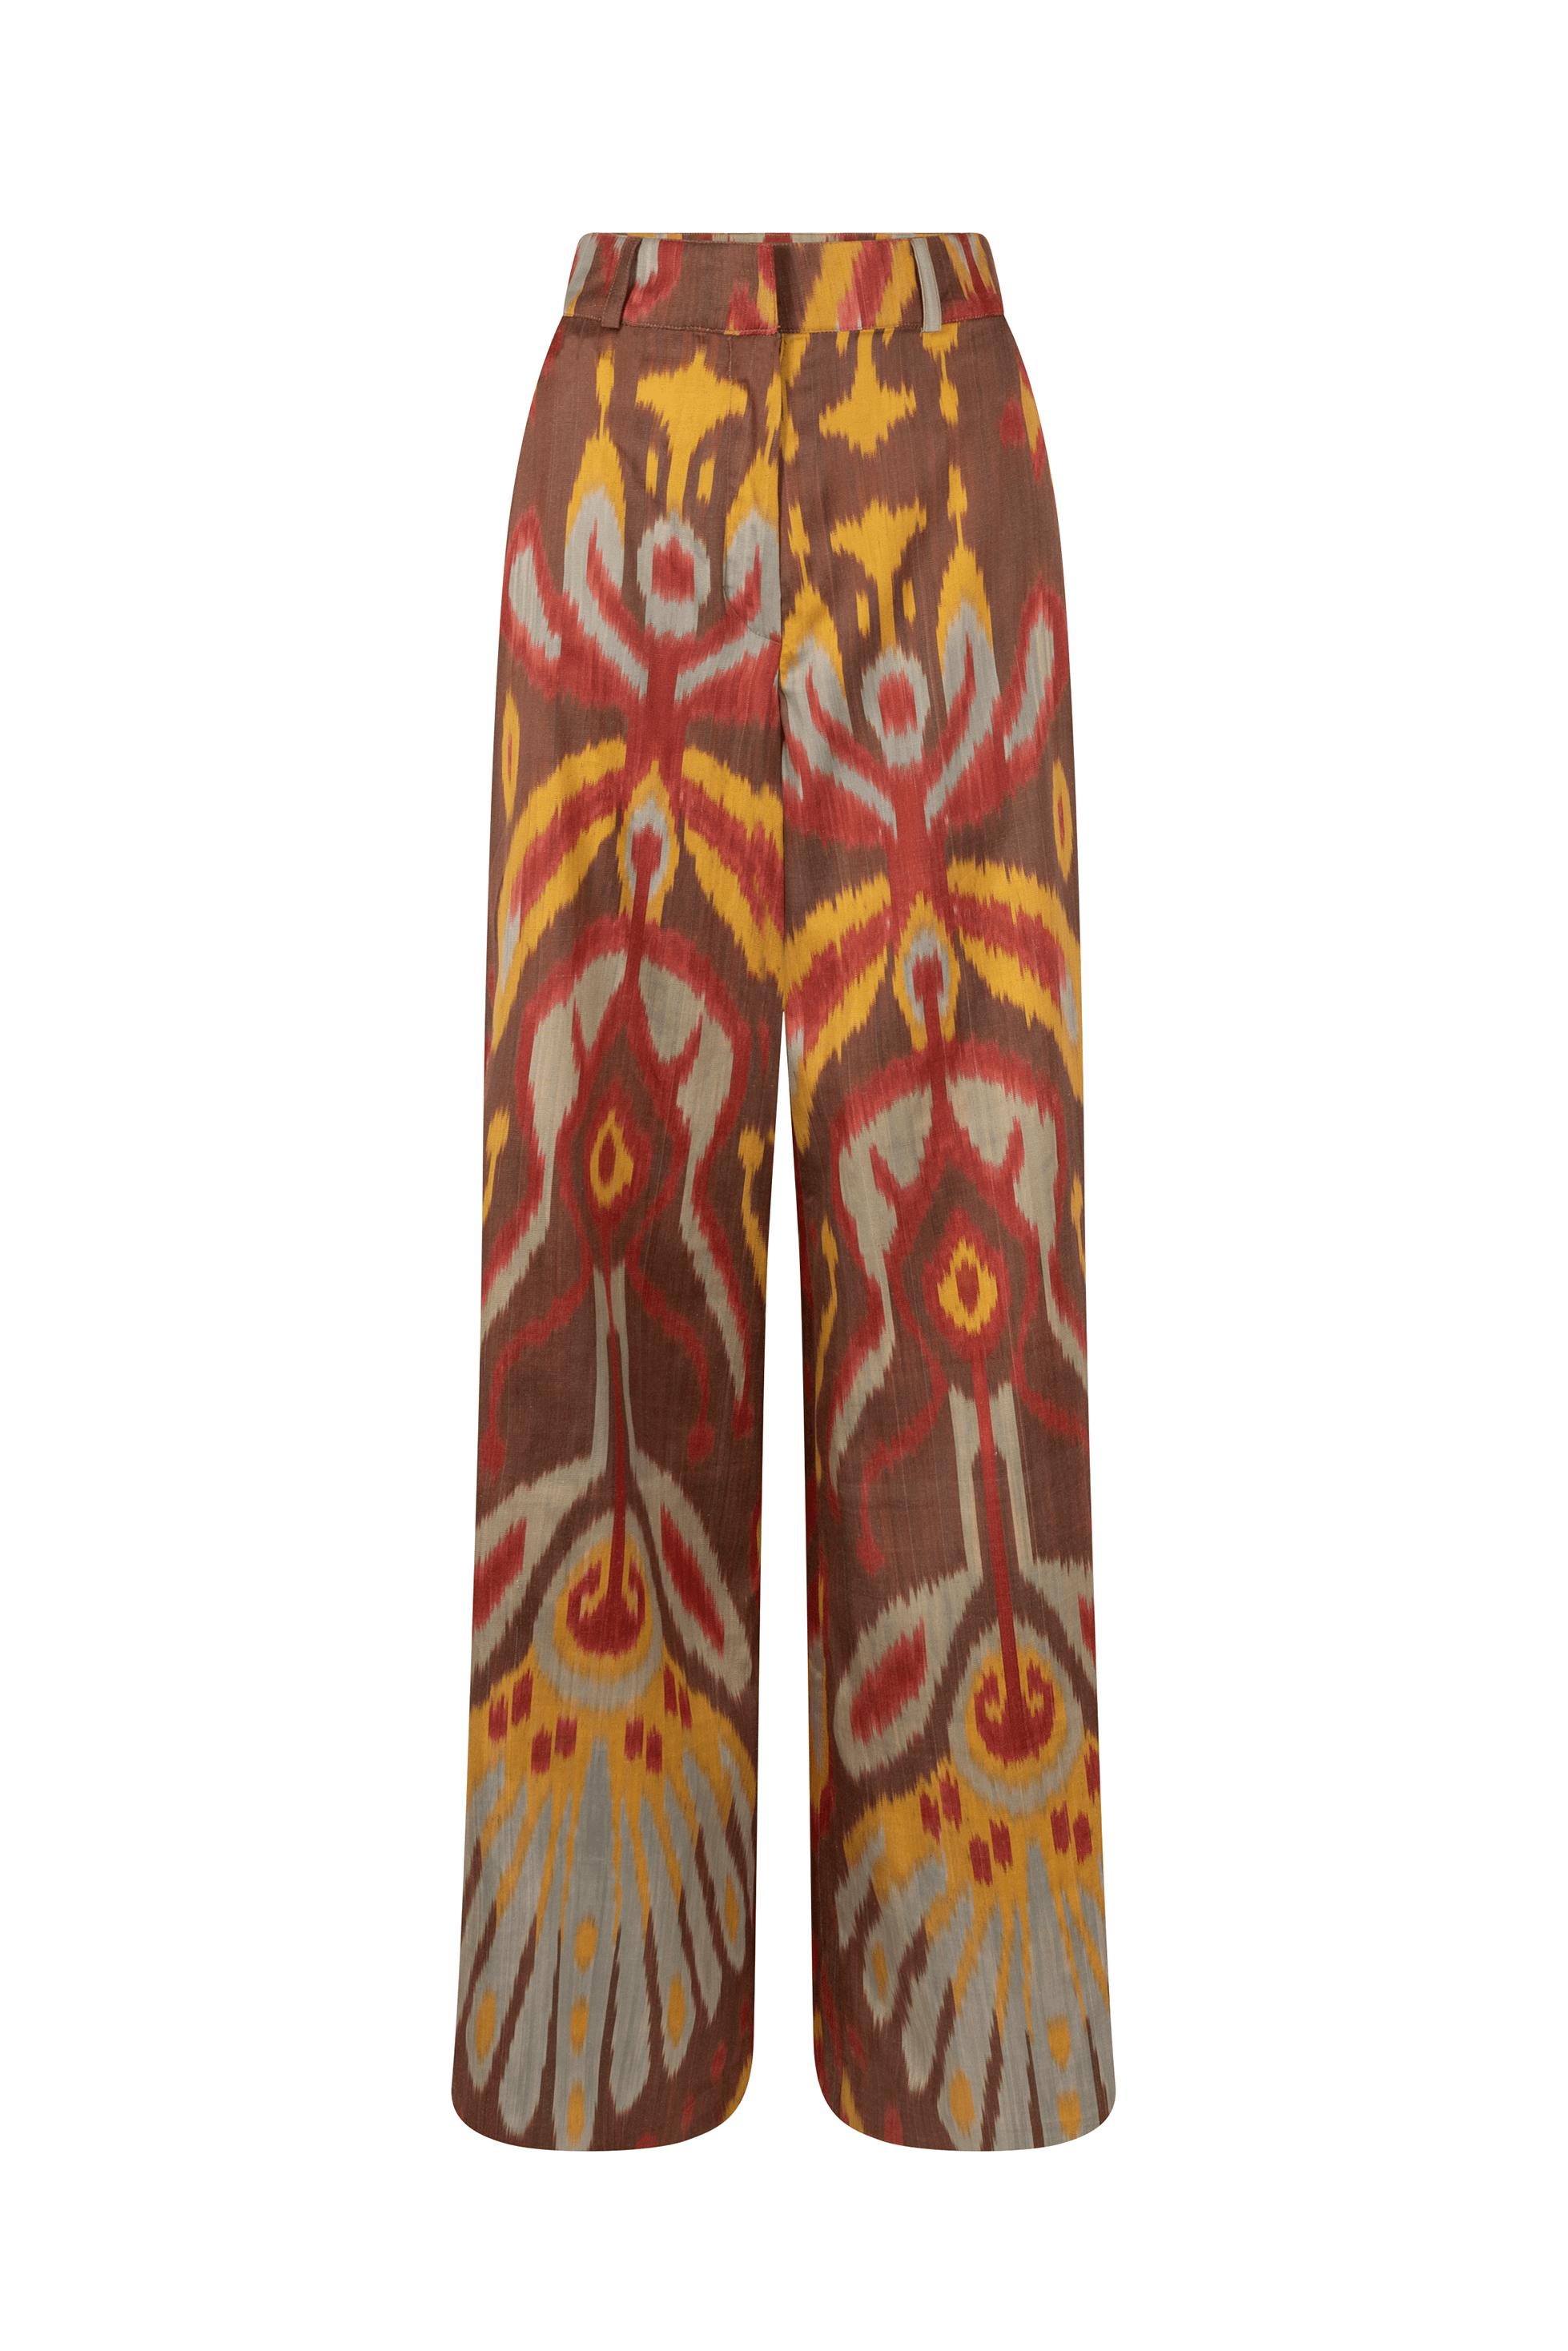 Naturally dyed ikat trousers - Medina